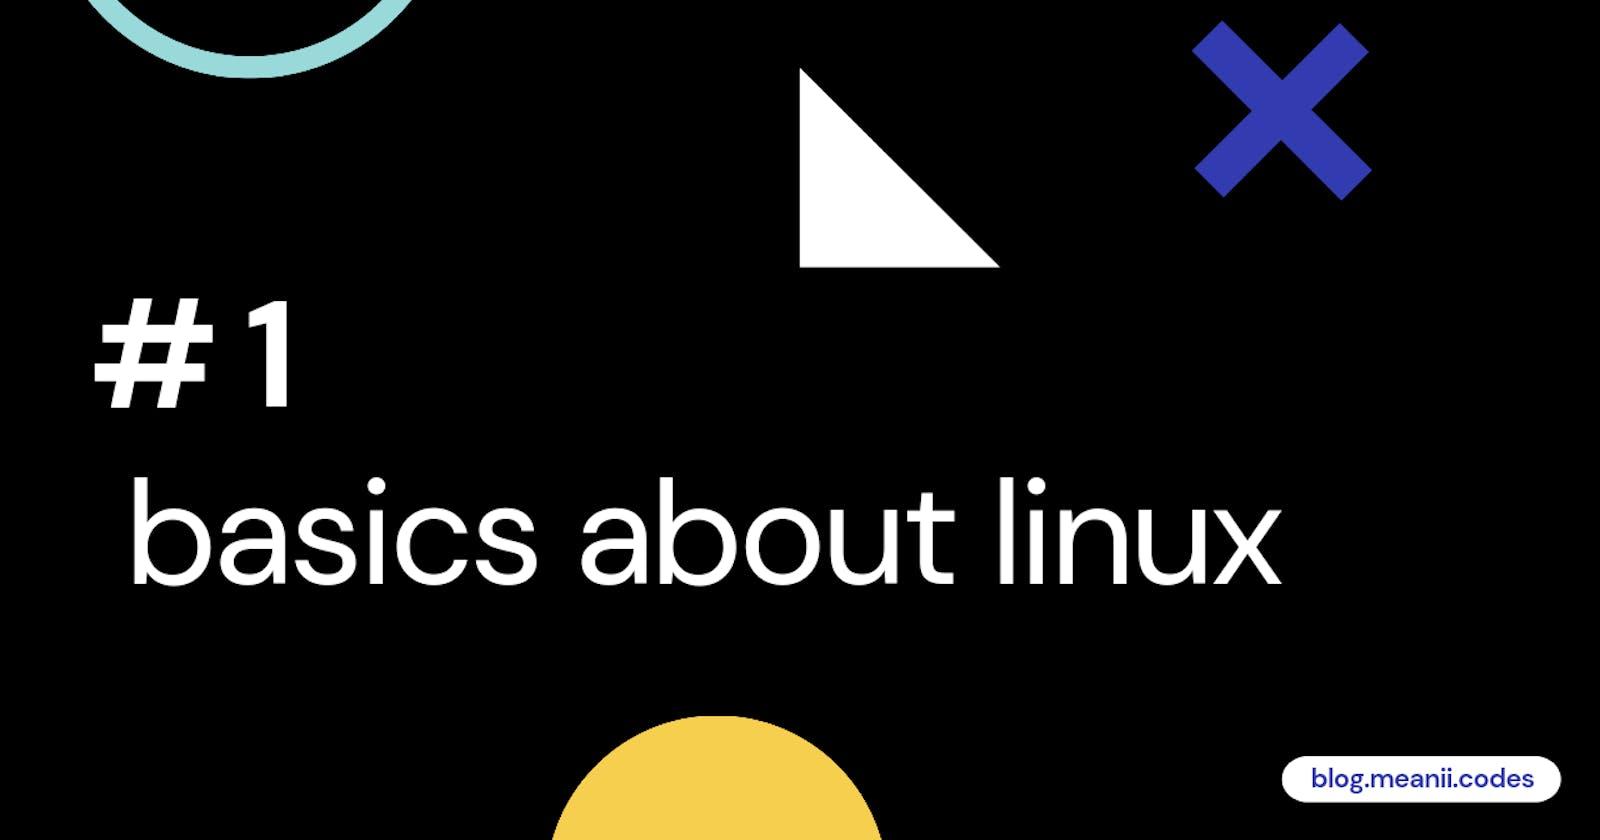 # 1 Basics about linux